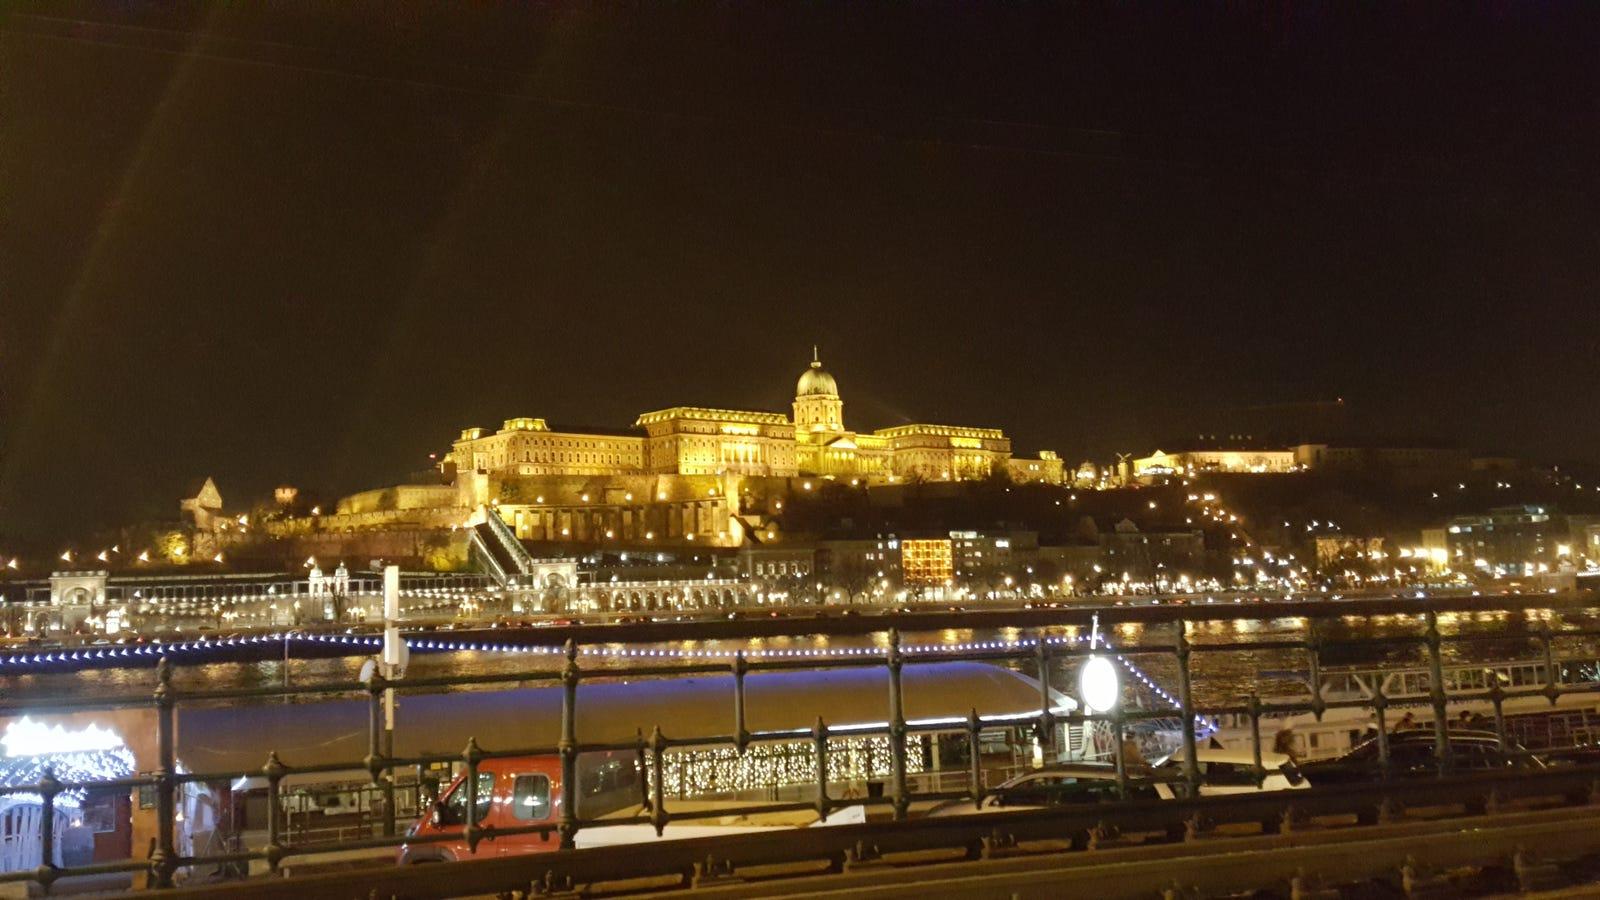 The lights of Buda Castle. Budapest, Hungary, November 2017